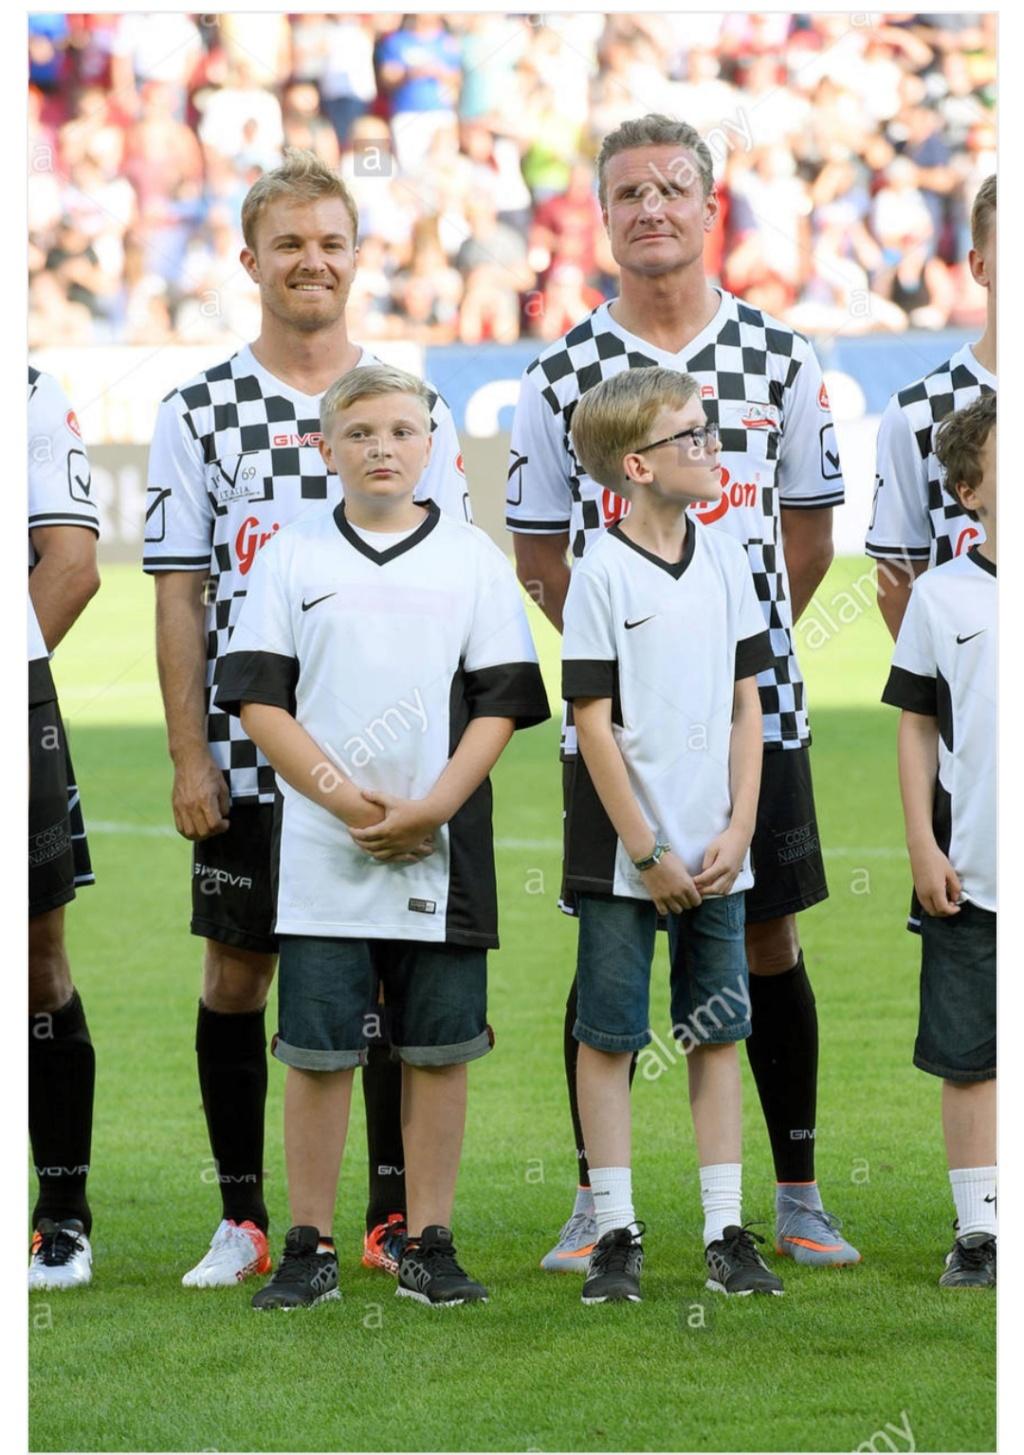 ¿Cuánto mide Nico Rosberg? - Altura - Real height Img_2045